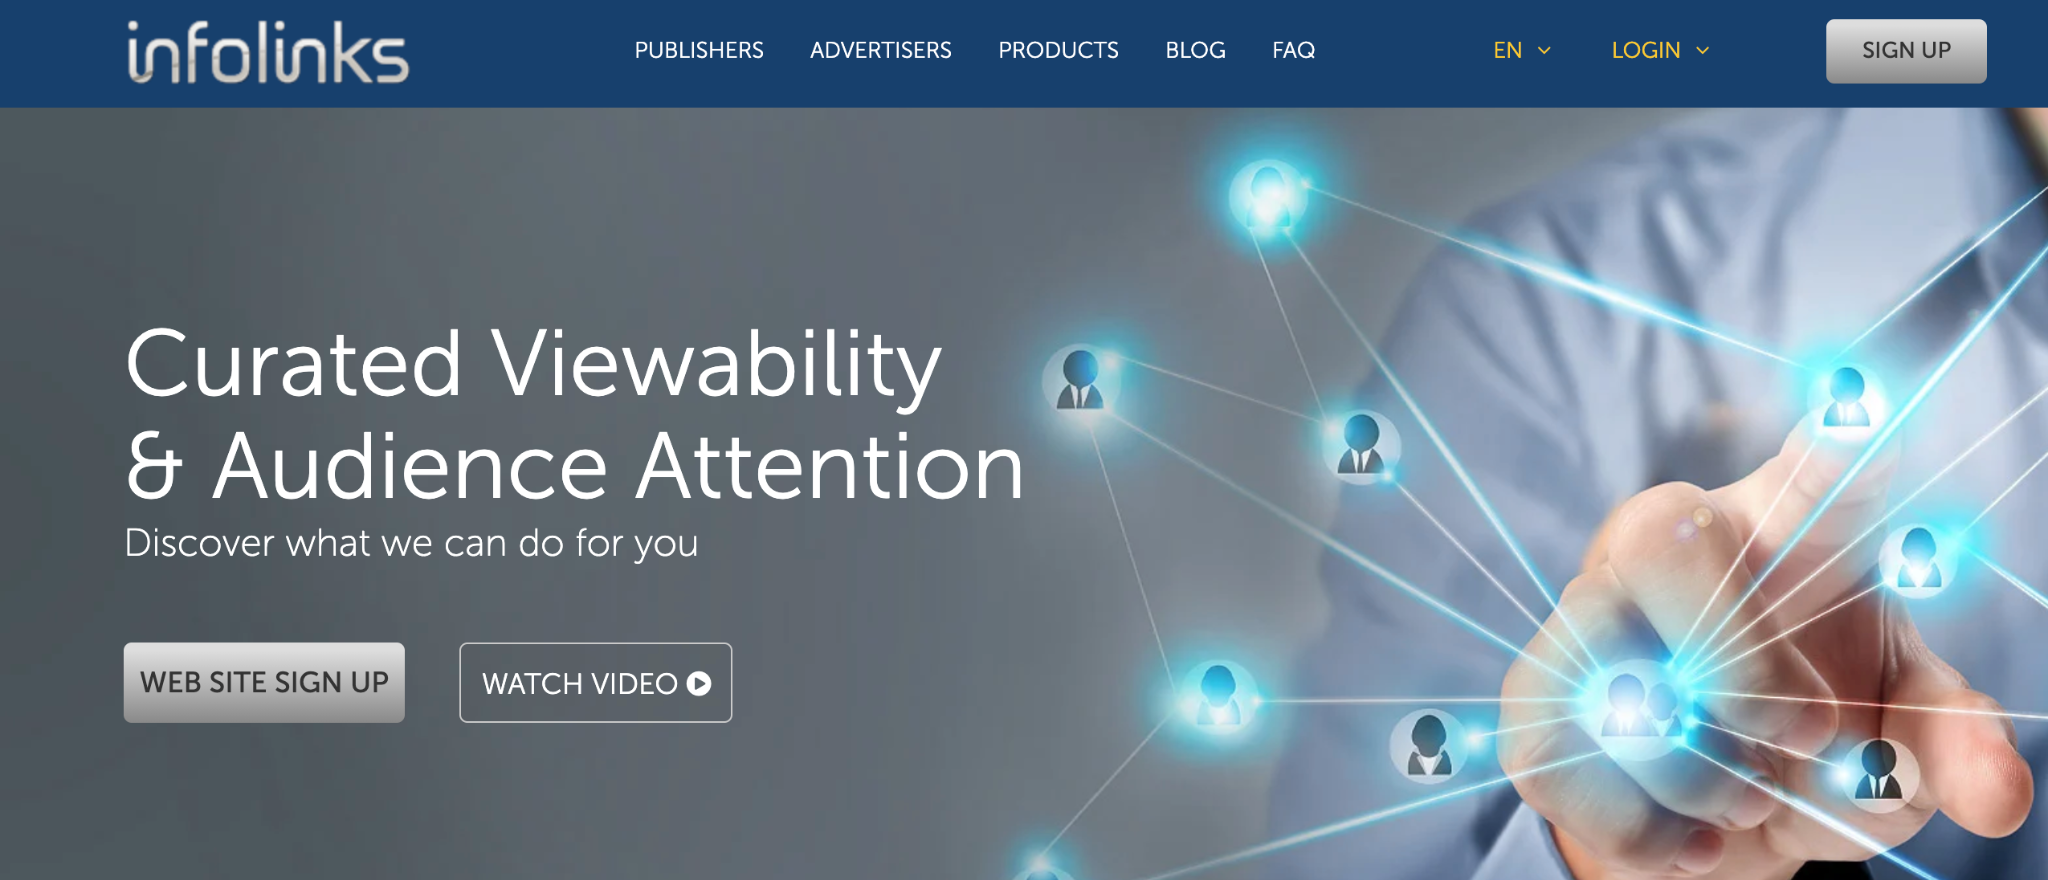 Infolinks Homepage